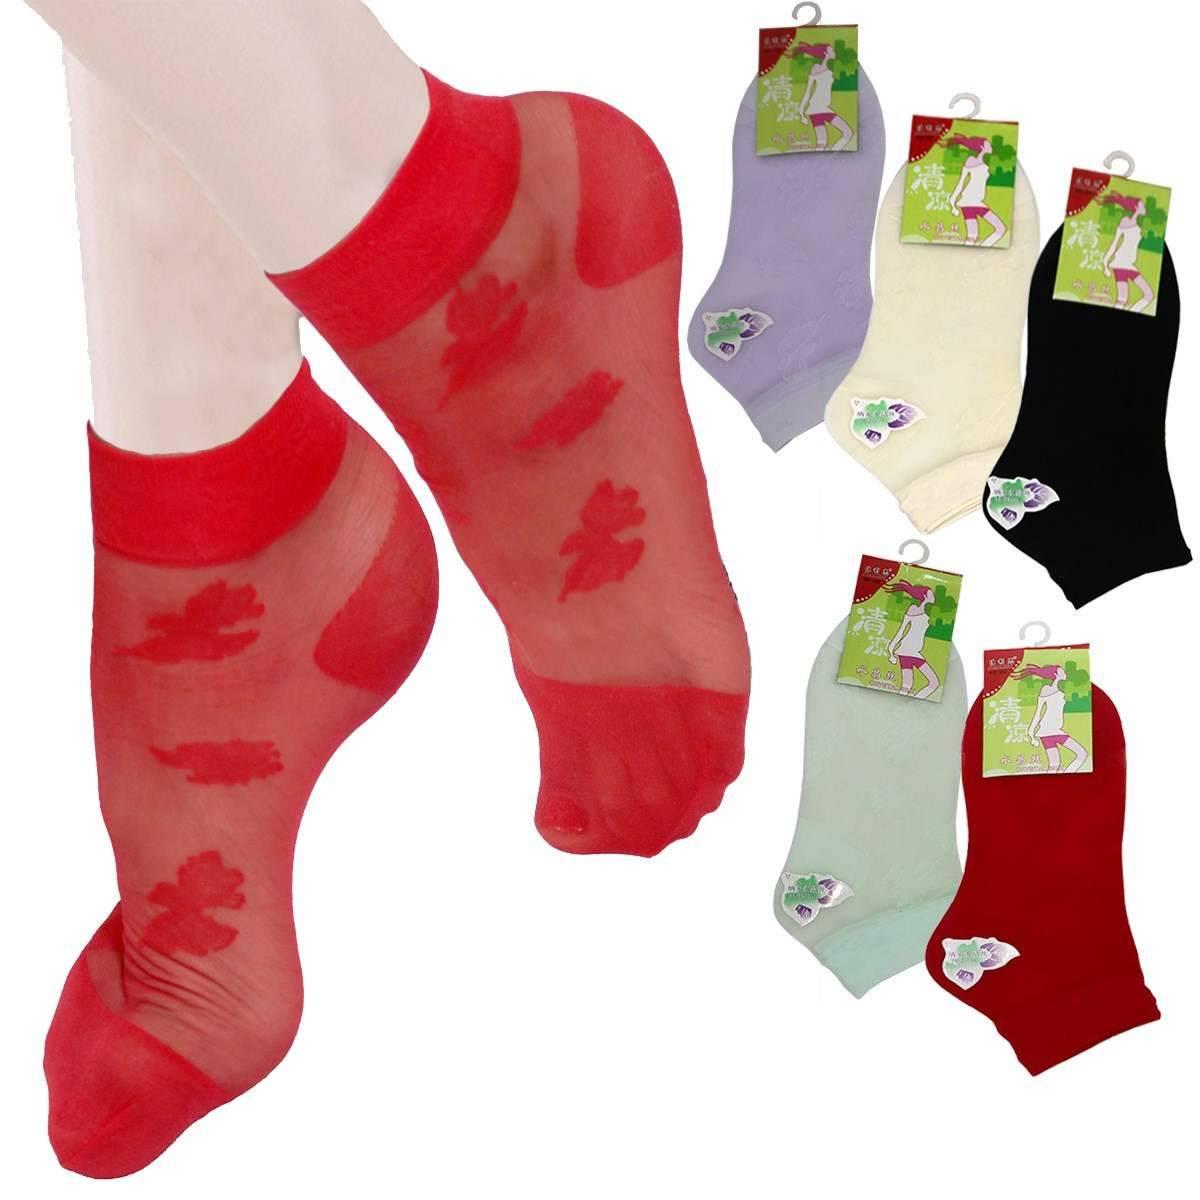 3 Pairs / Net Breathable Comfortable Socks For Women / Girls